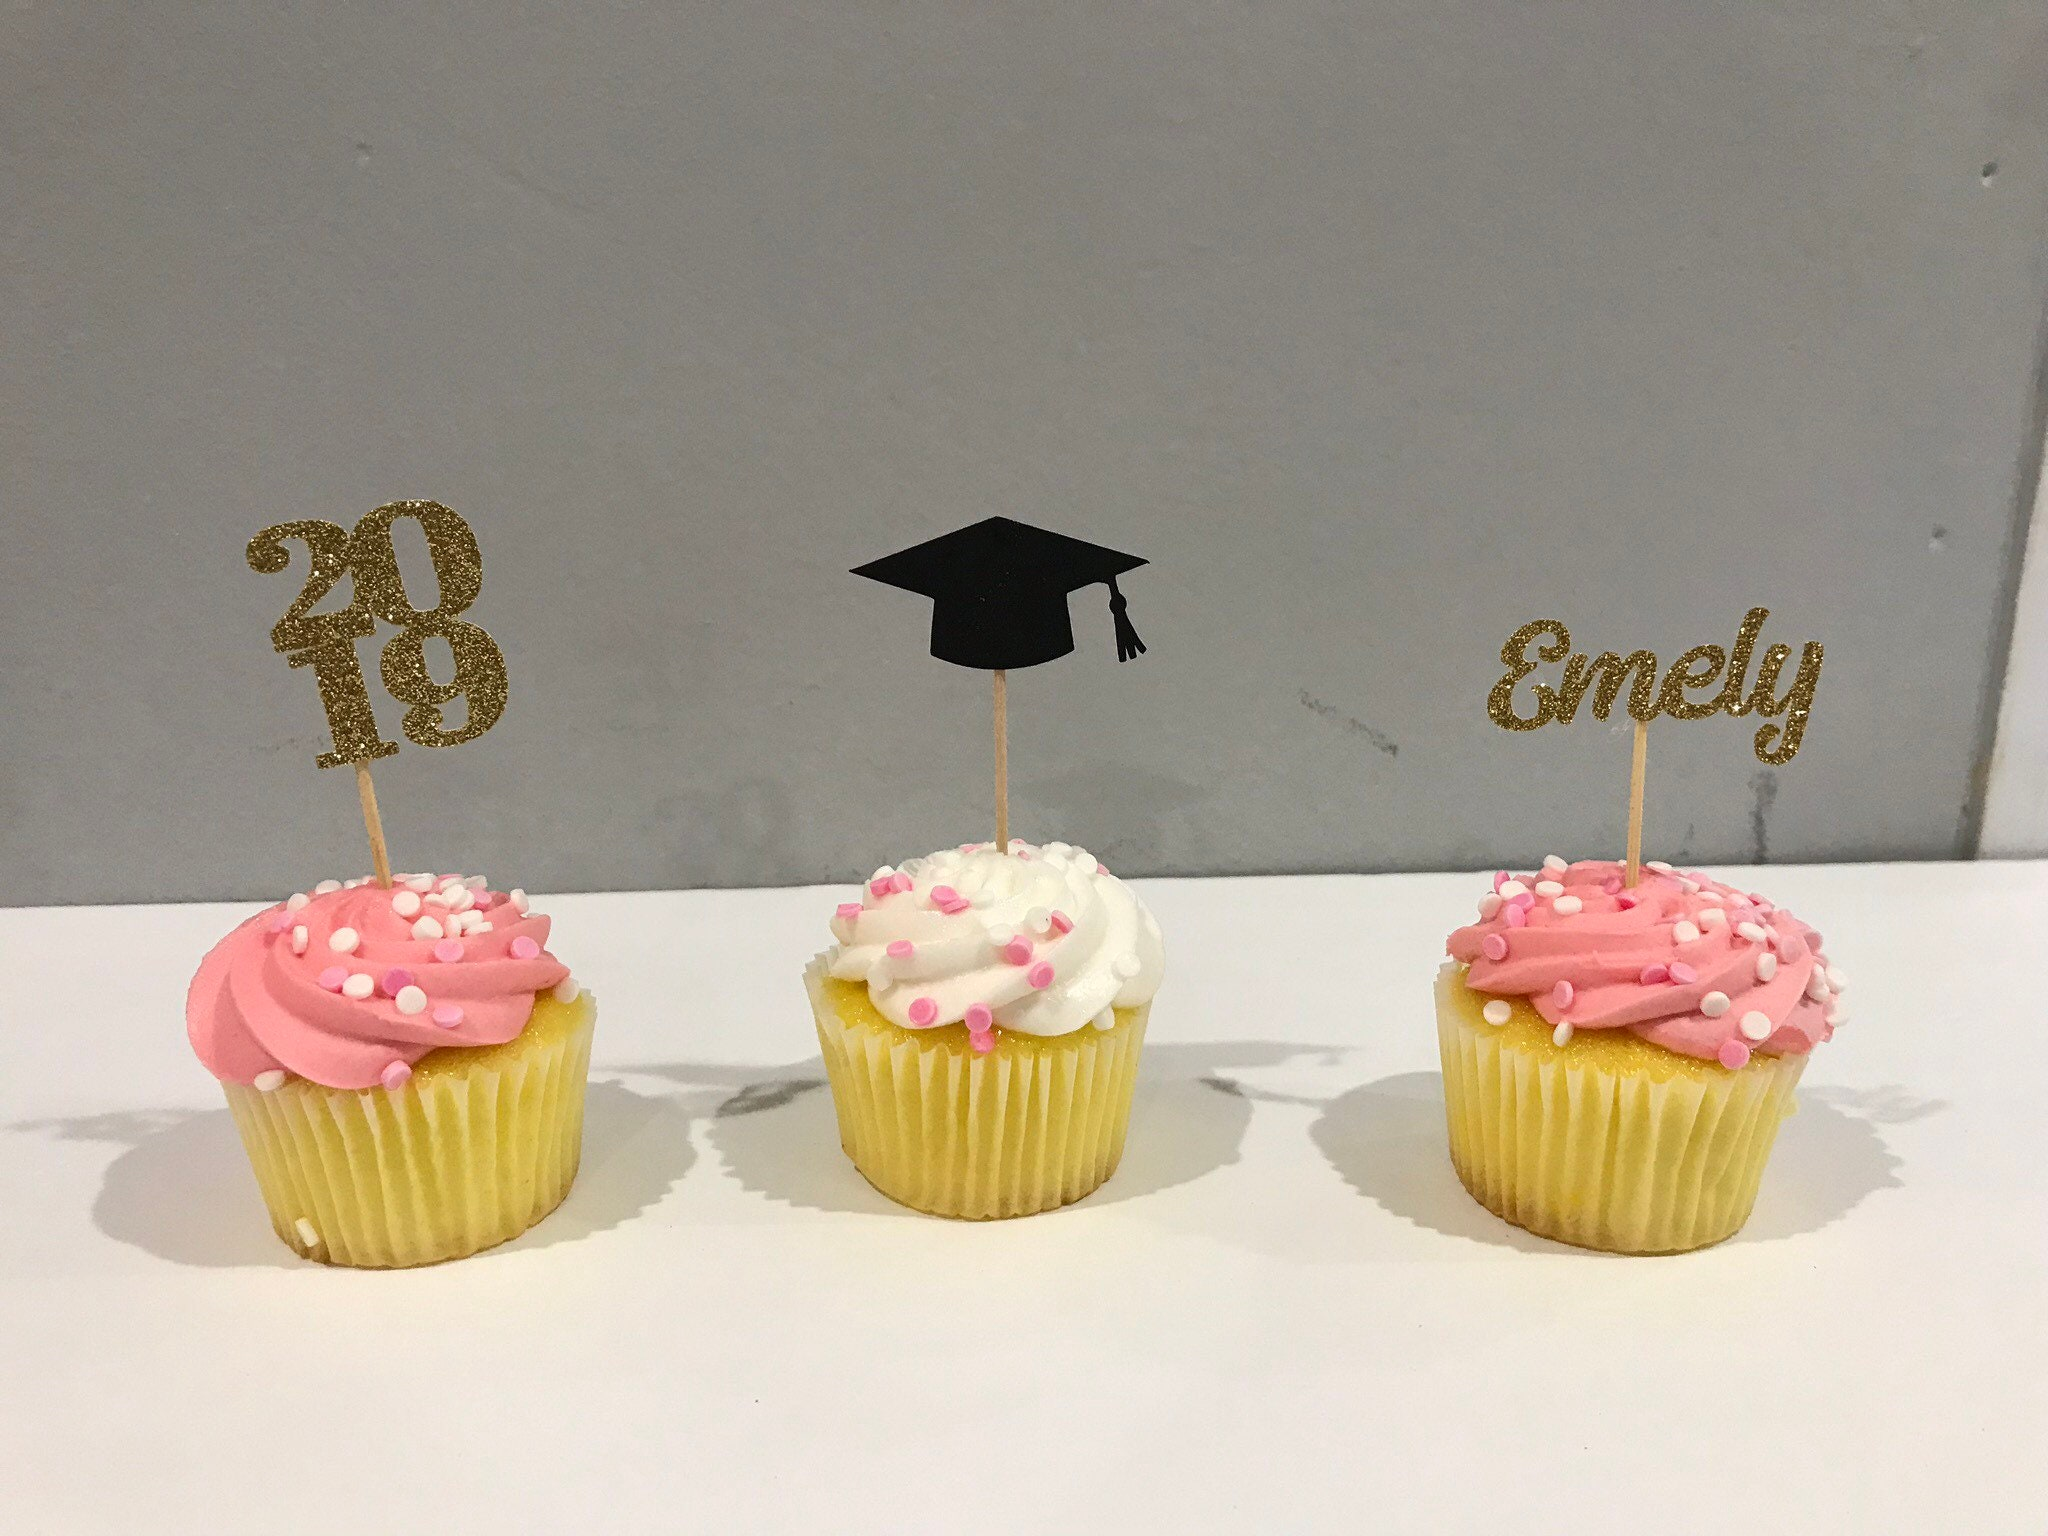 Graduation Party Decoartions 2019 Graduation Cupcake